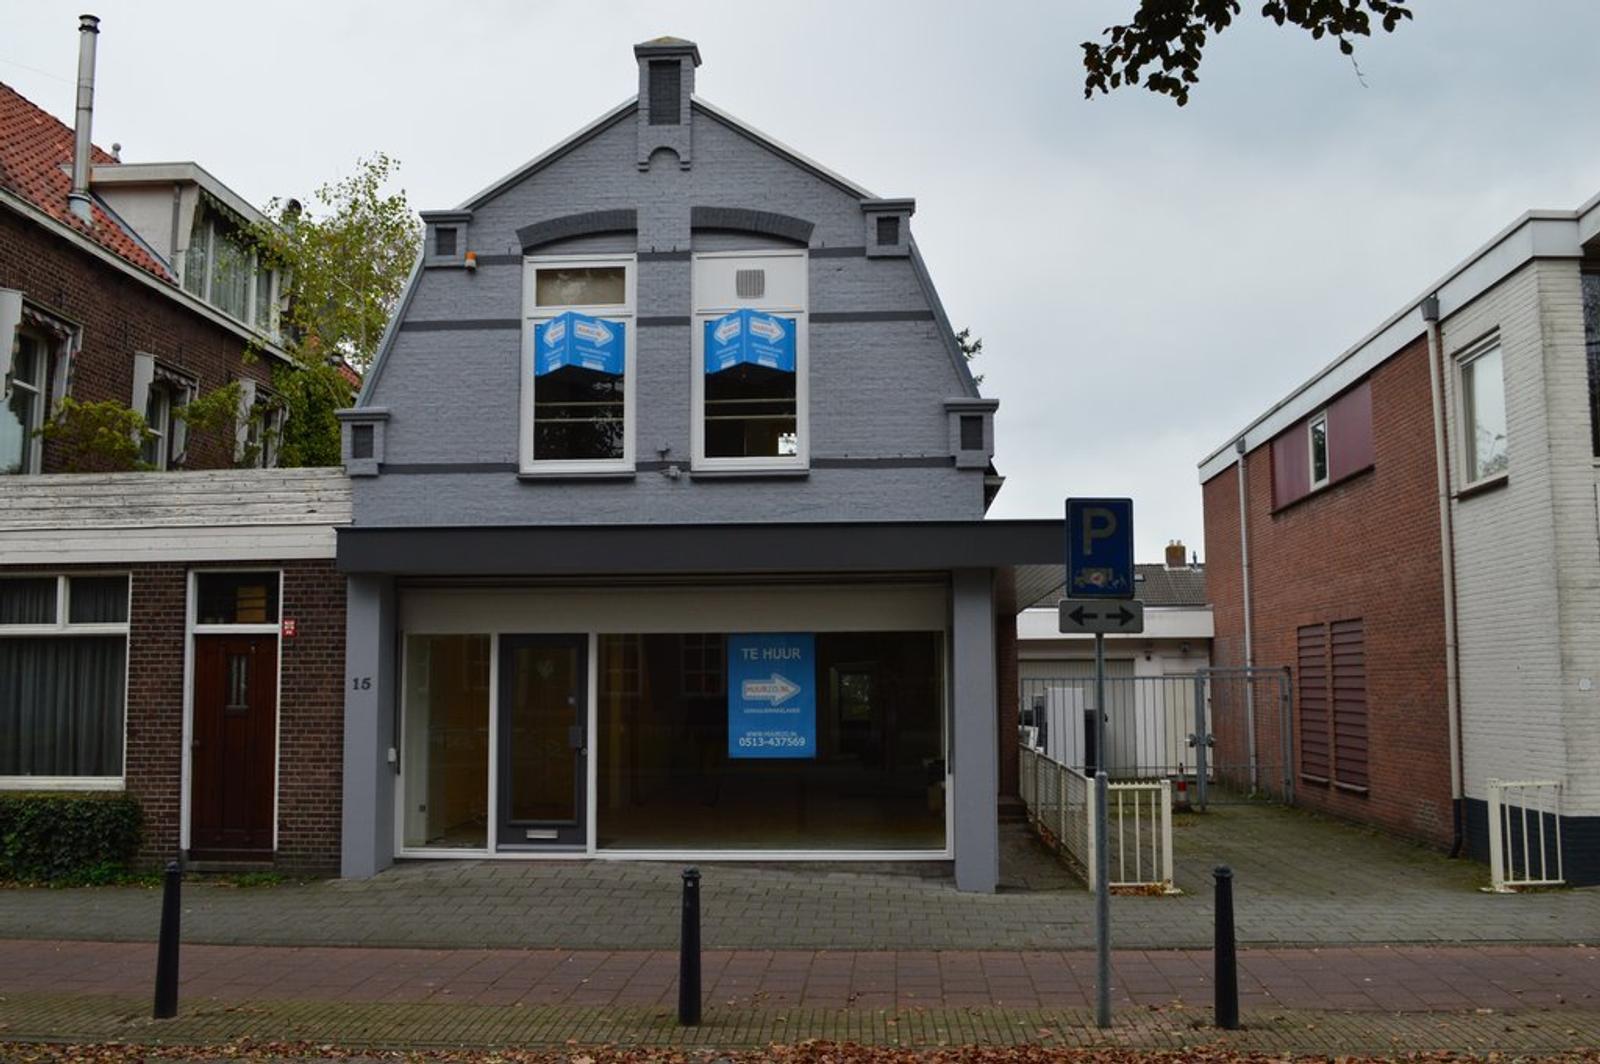 Burgemeester Falkenaweg 15